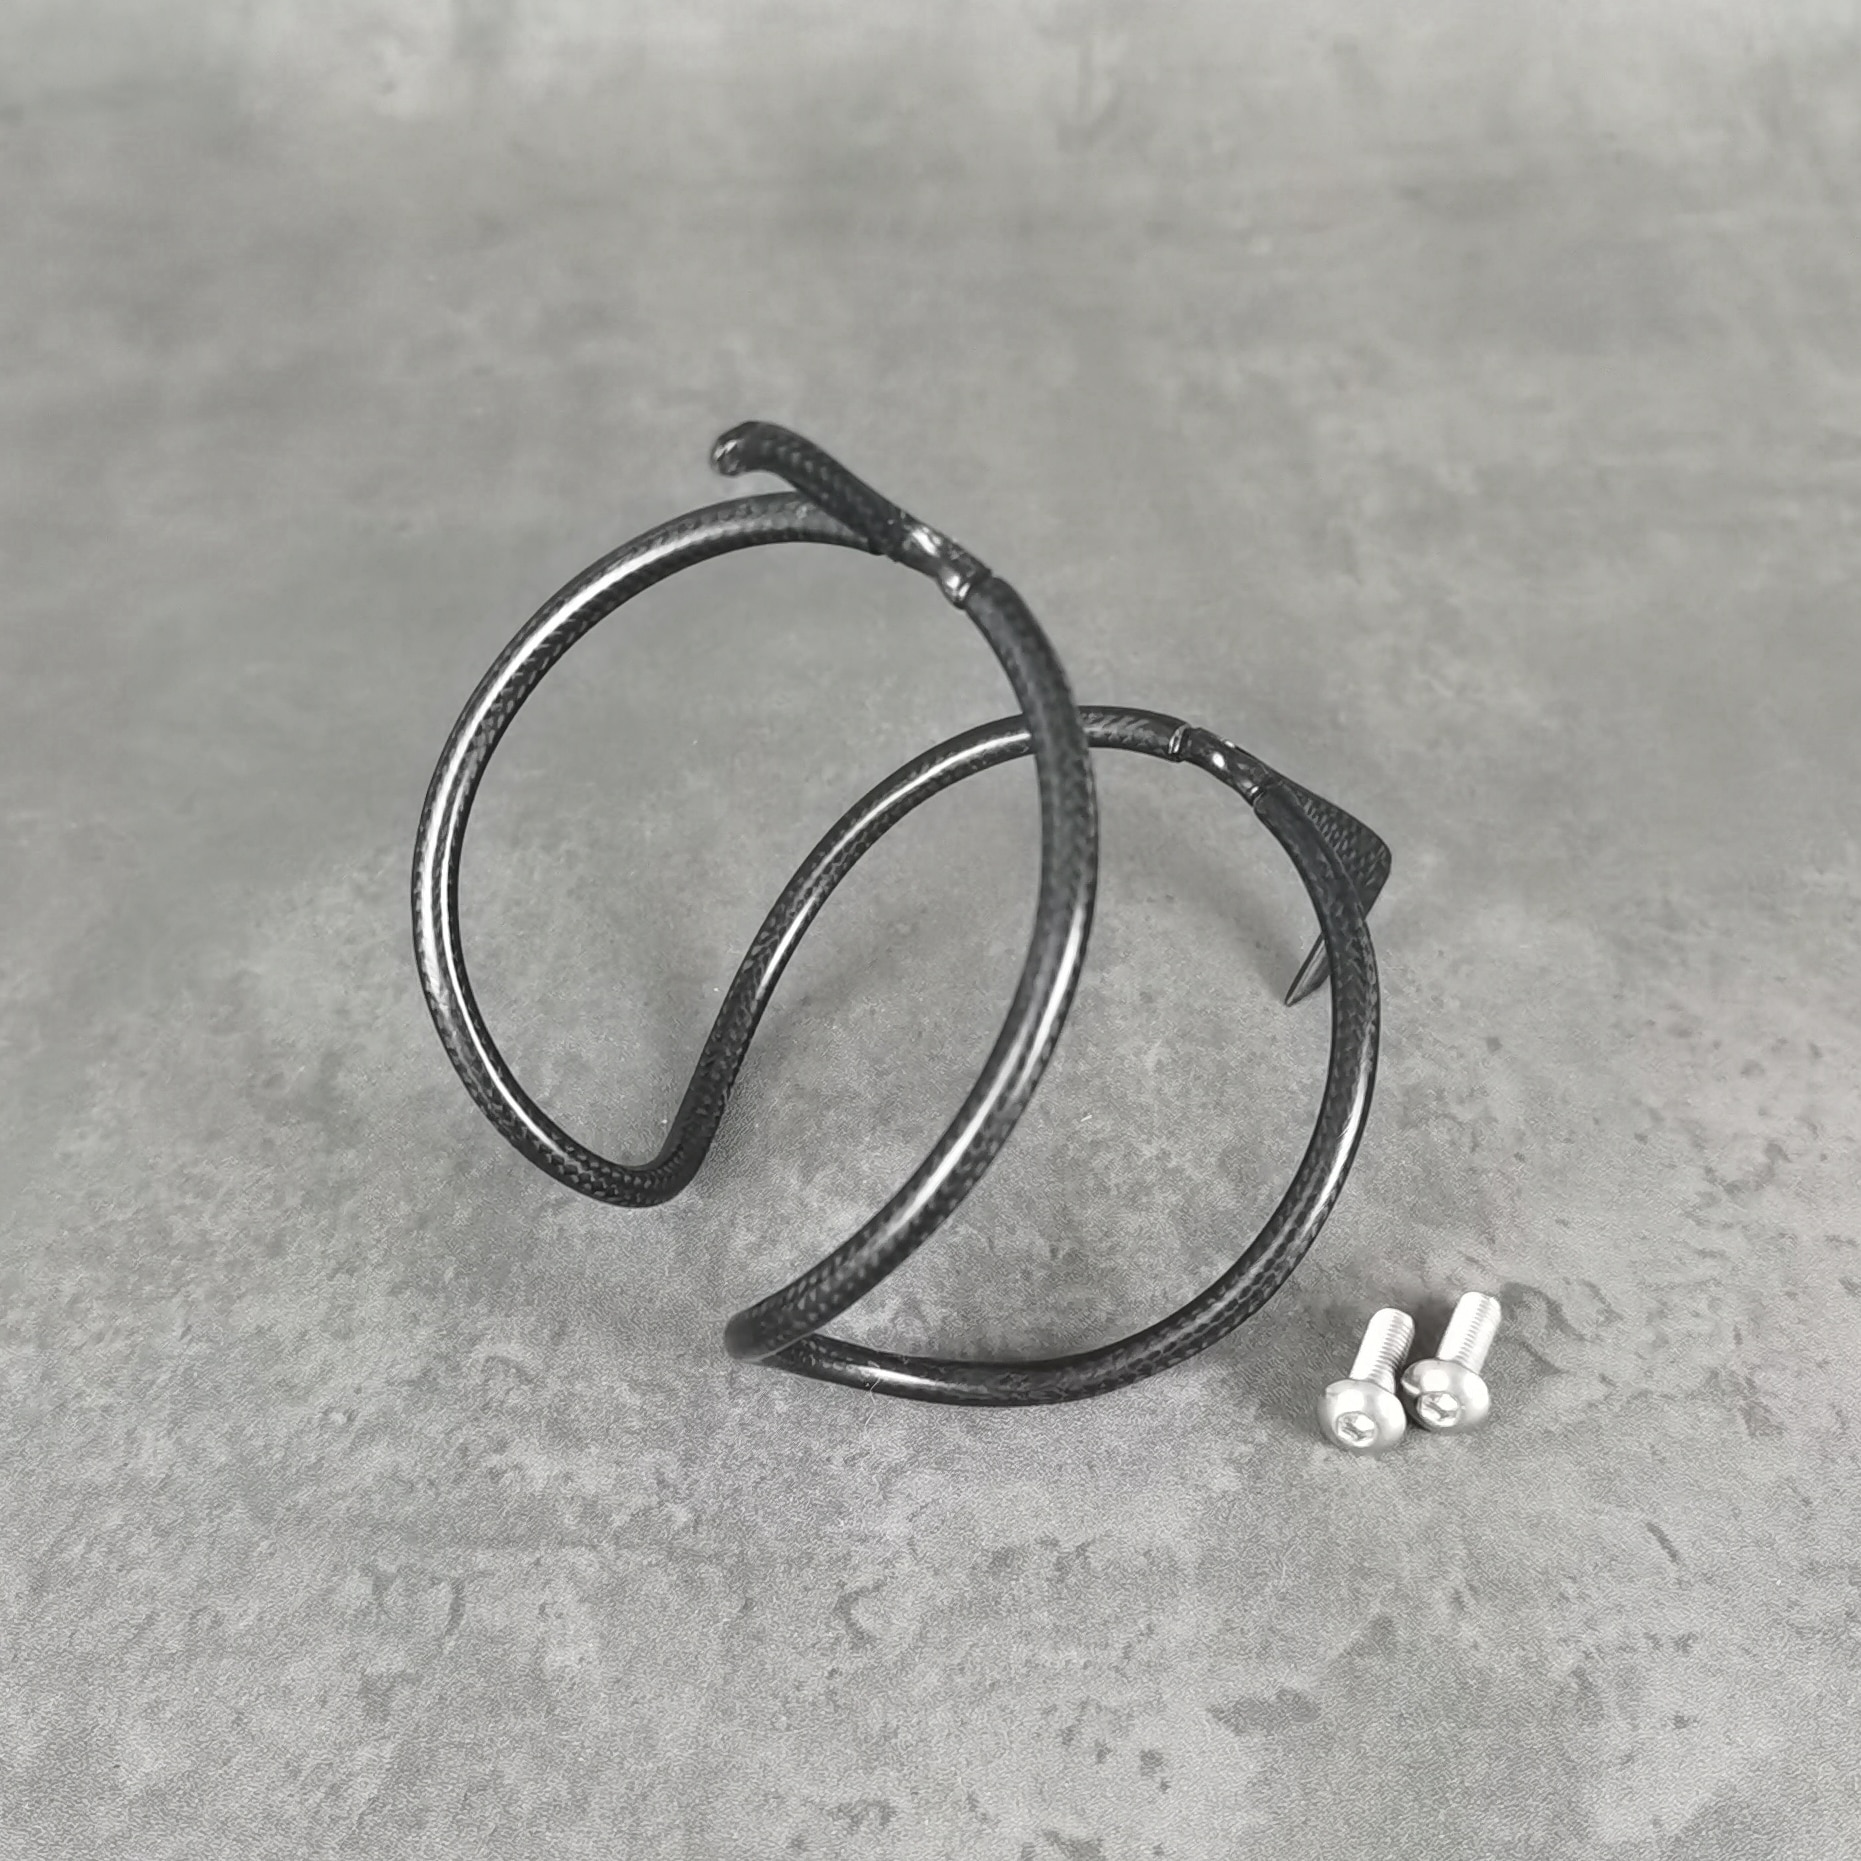 Envío gratis de portabotellas de fibra de carbono MTB/soporte de botella de agua de bicicleta de carretera tornillos de acero inoxidable súper ligeros